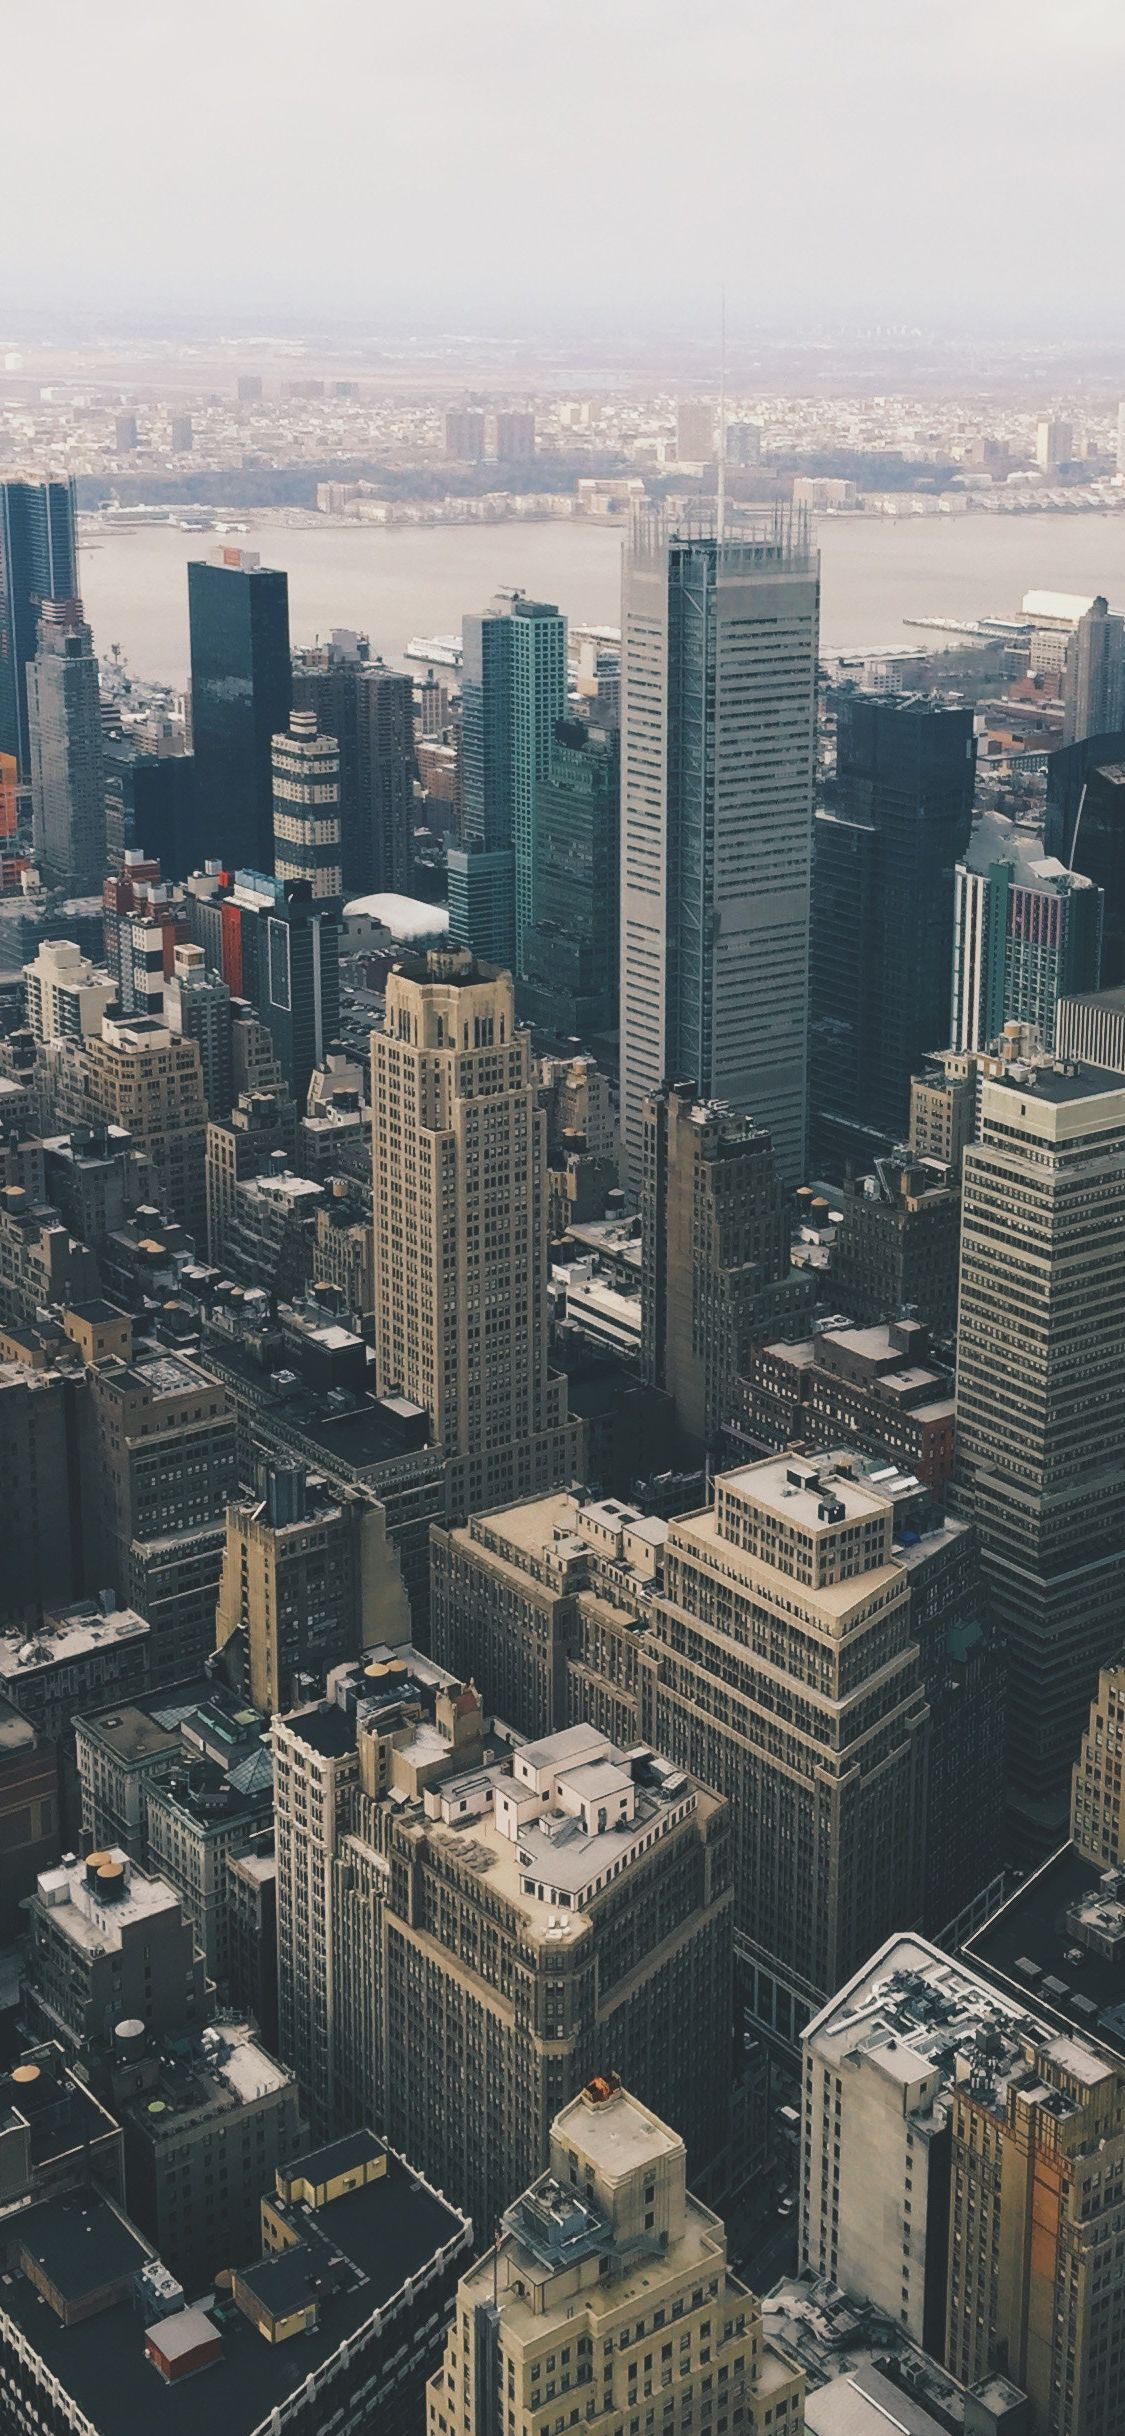 Cool Iphone X Wallpaper 4k Download Tecnologist City Iphone Wallpaper Stunning Wallpapers New York Wallpaper